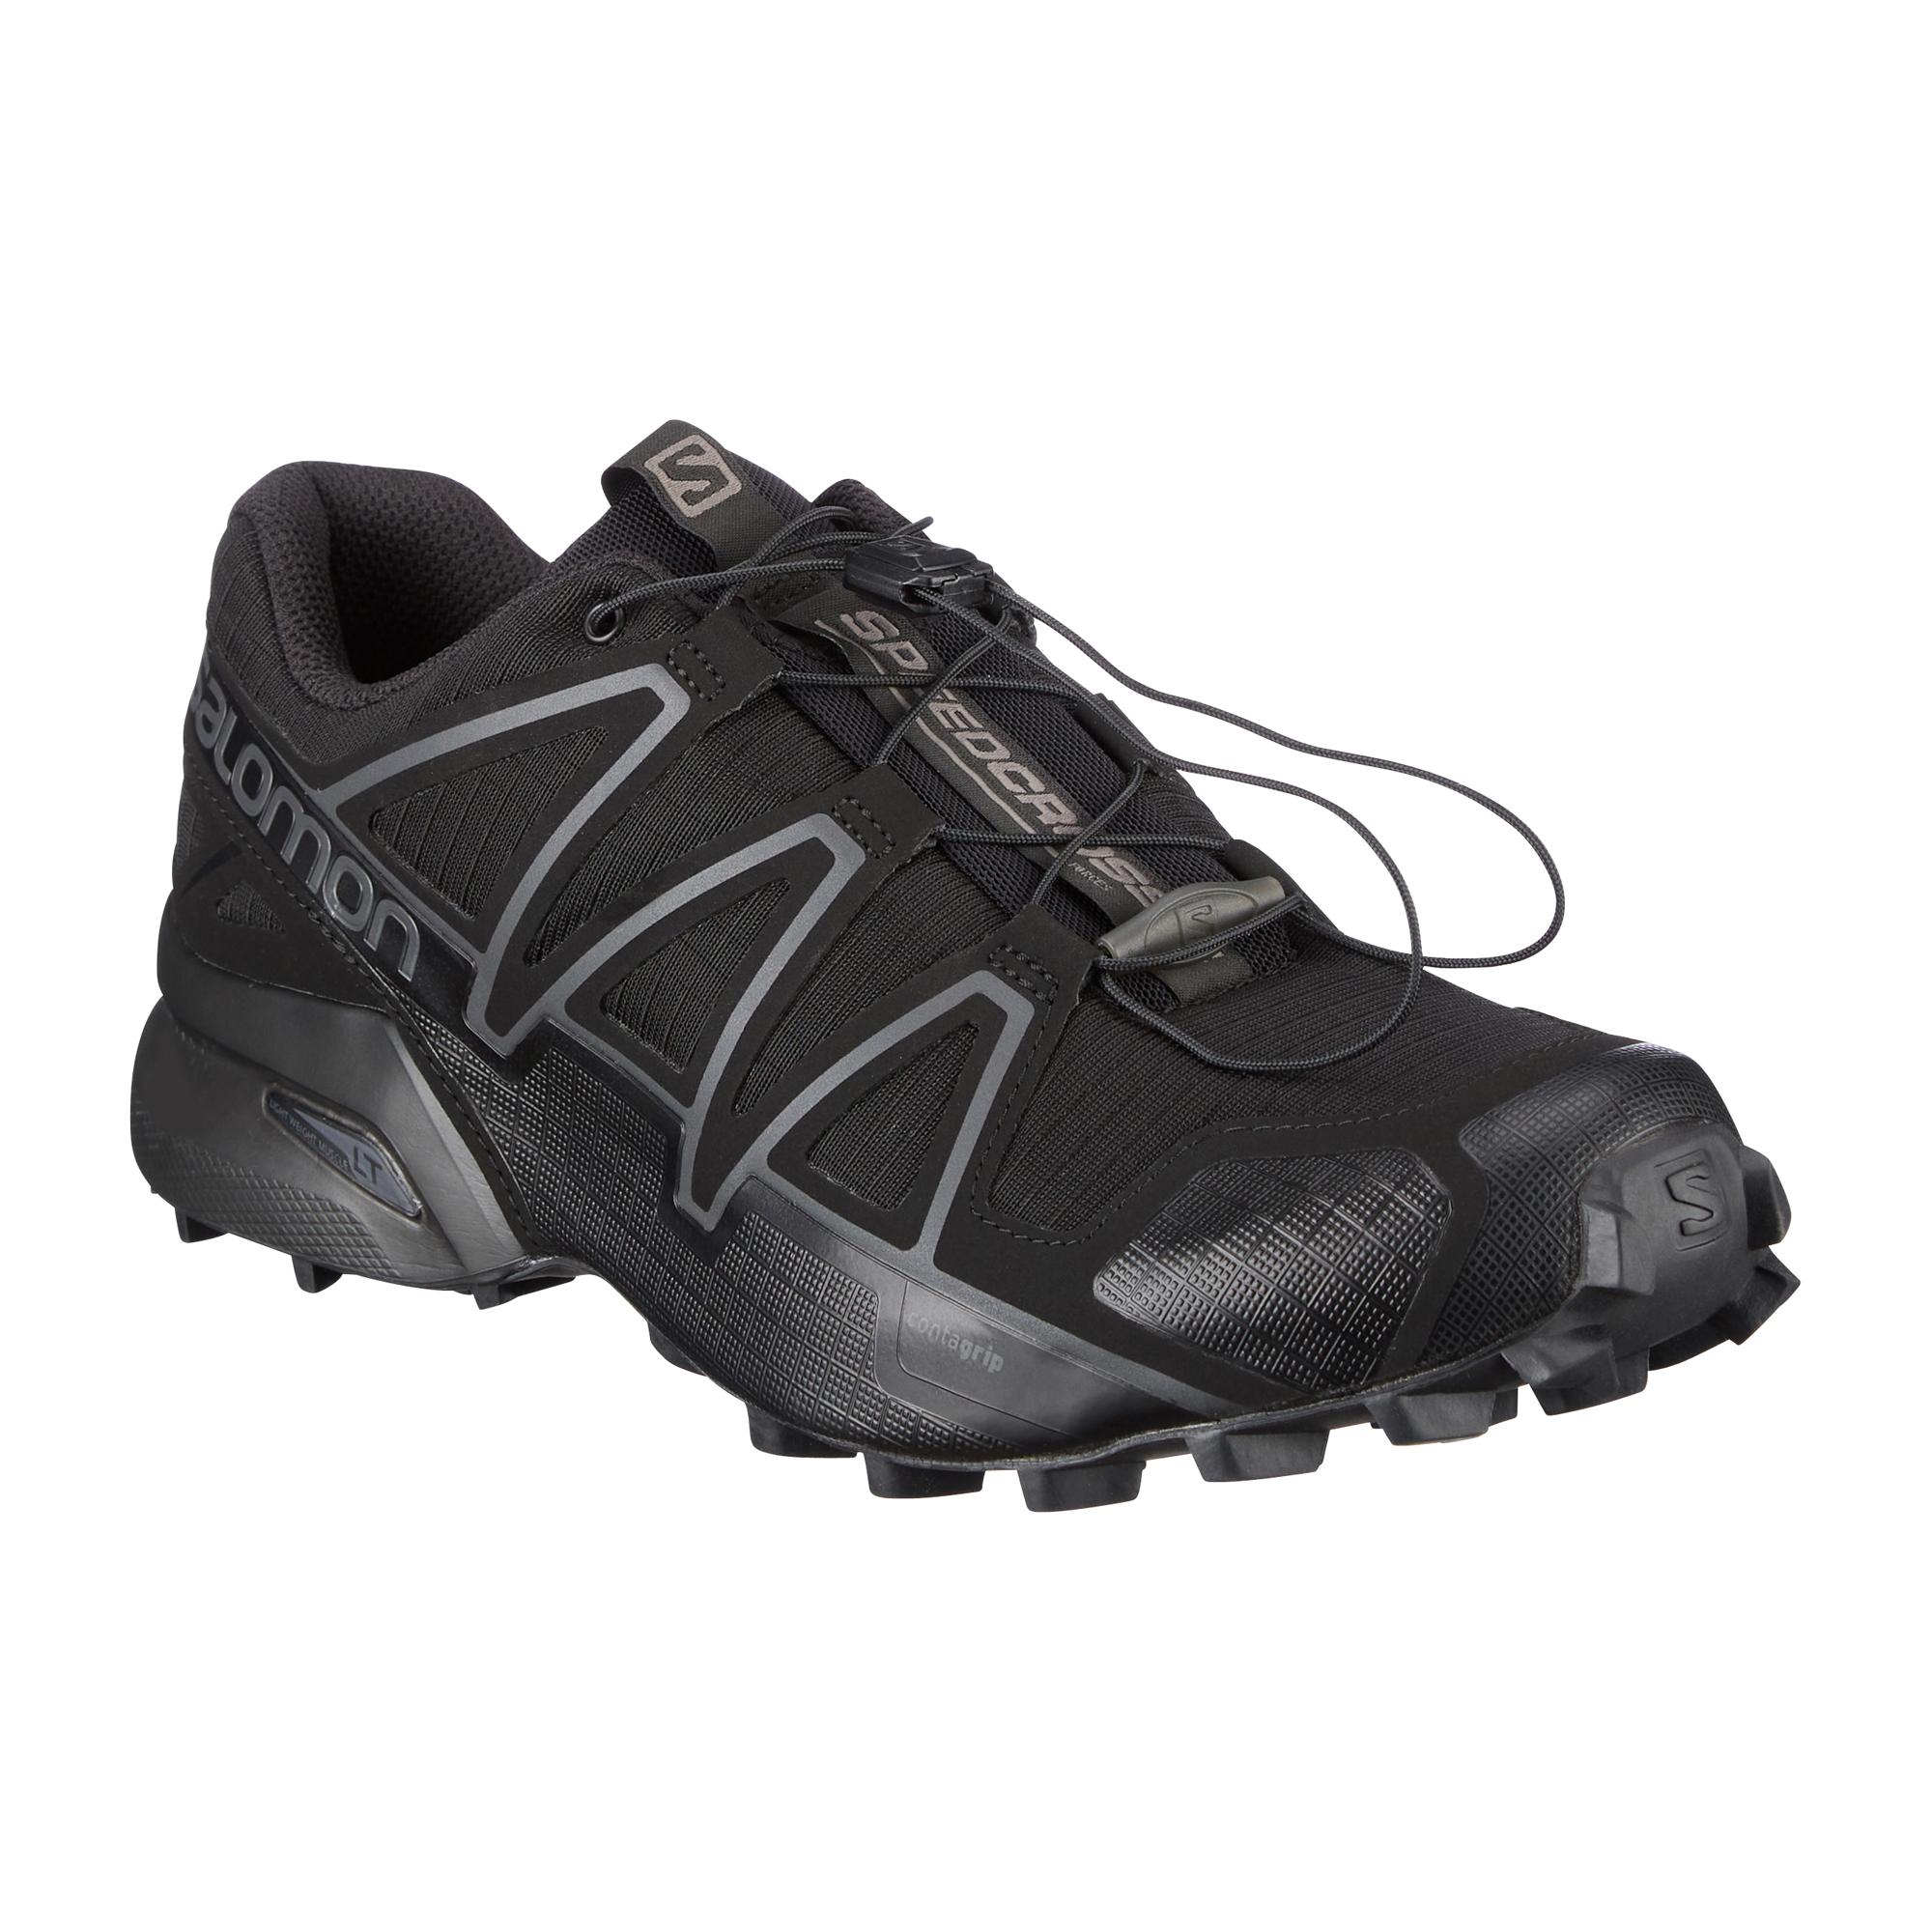 Purchase the Salomon Shoe Speedcross 4